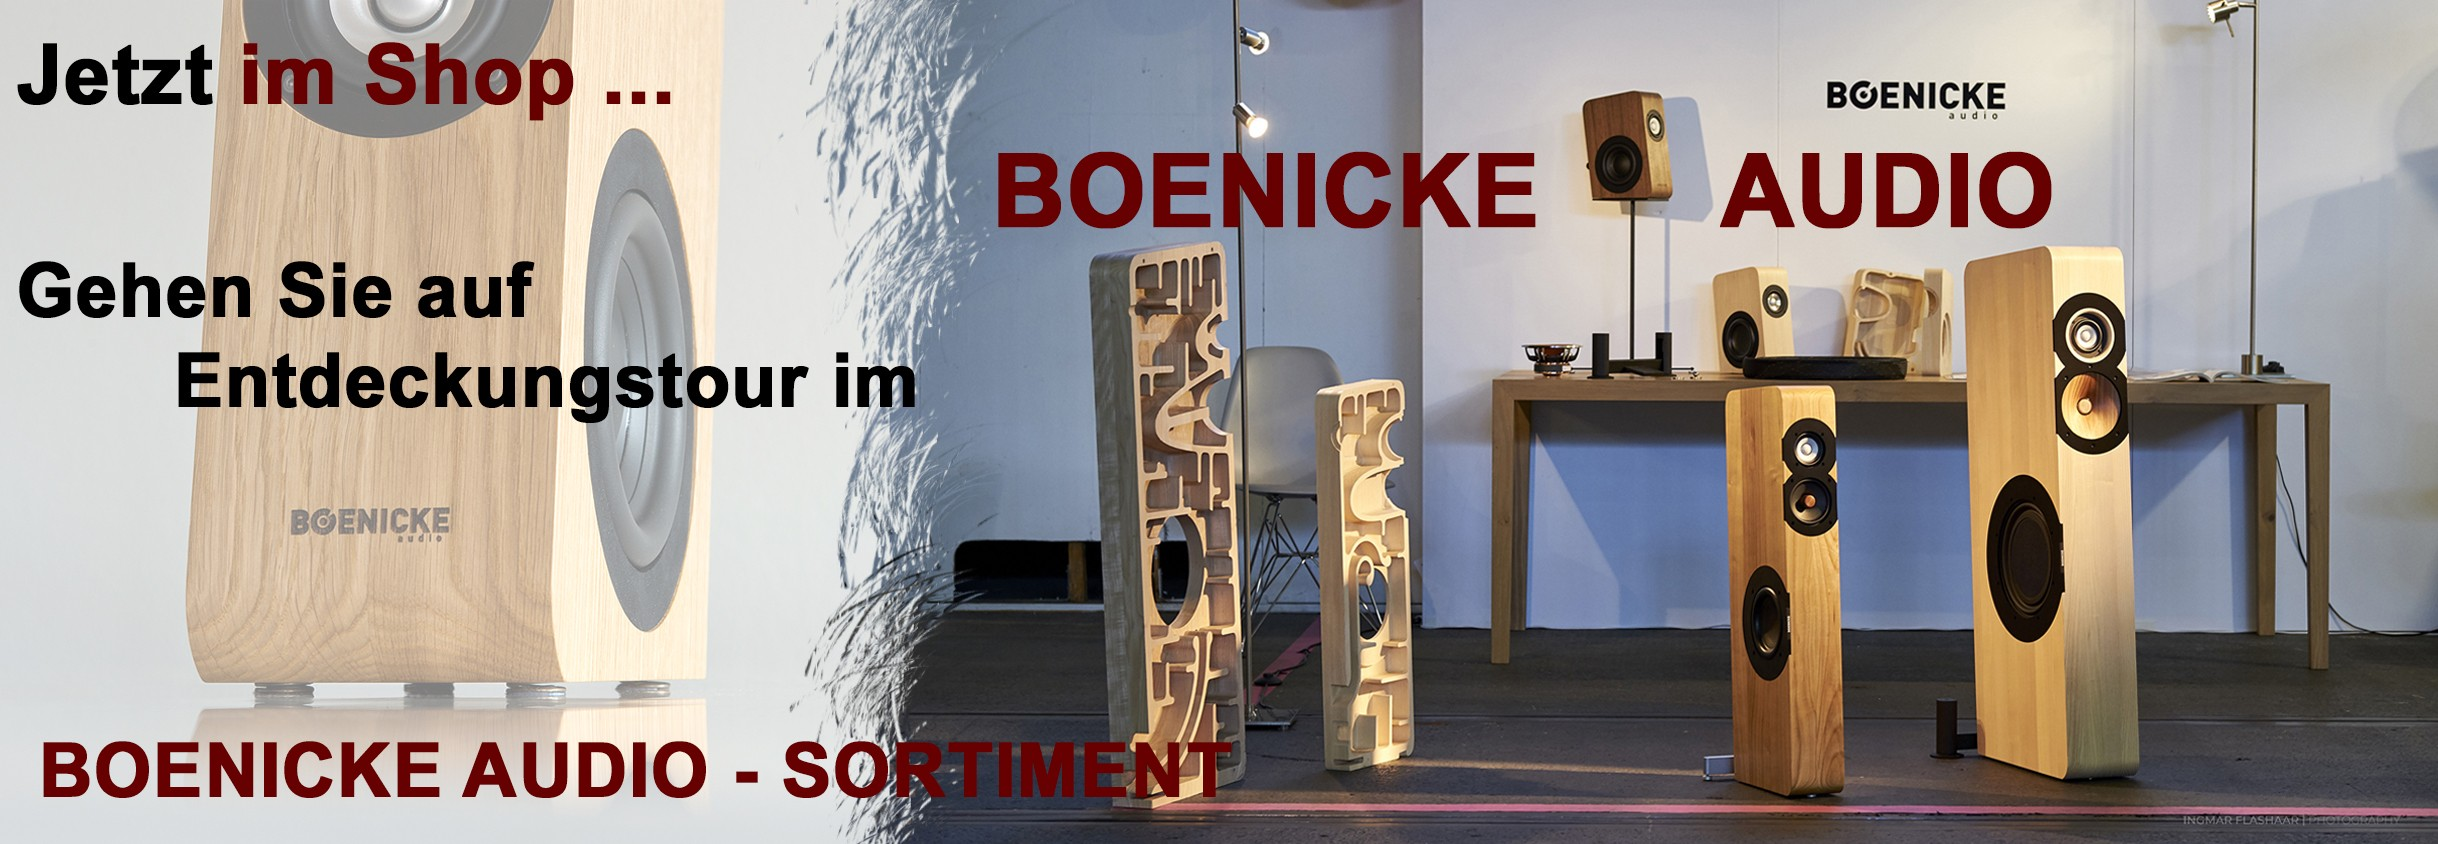 Boenicke Audio